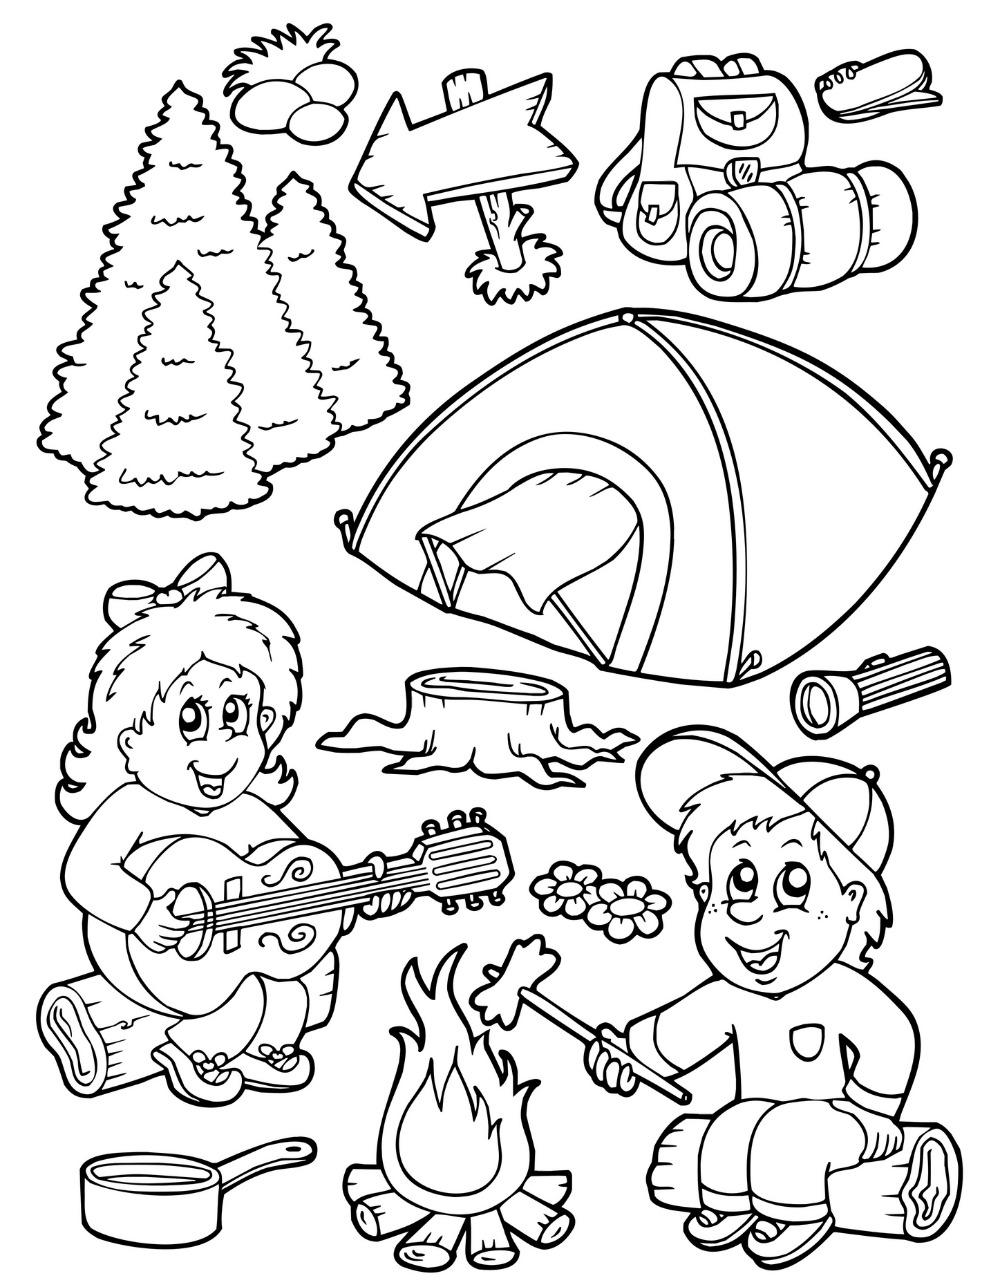 Camp coloring #2, Download drawings